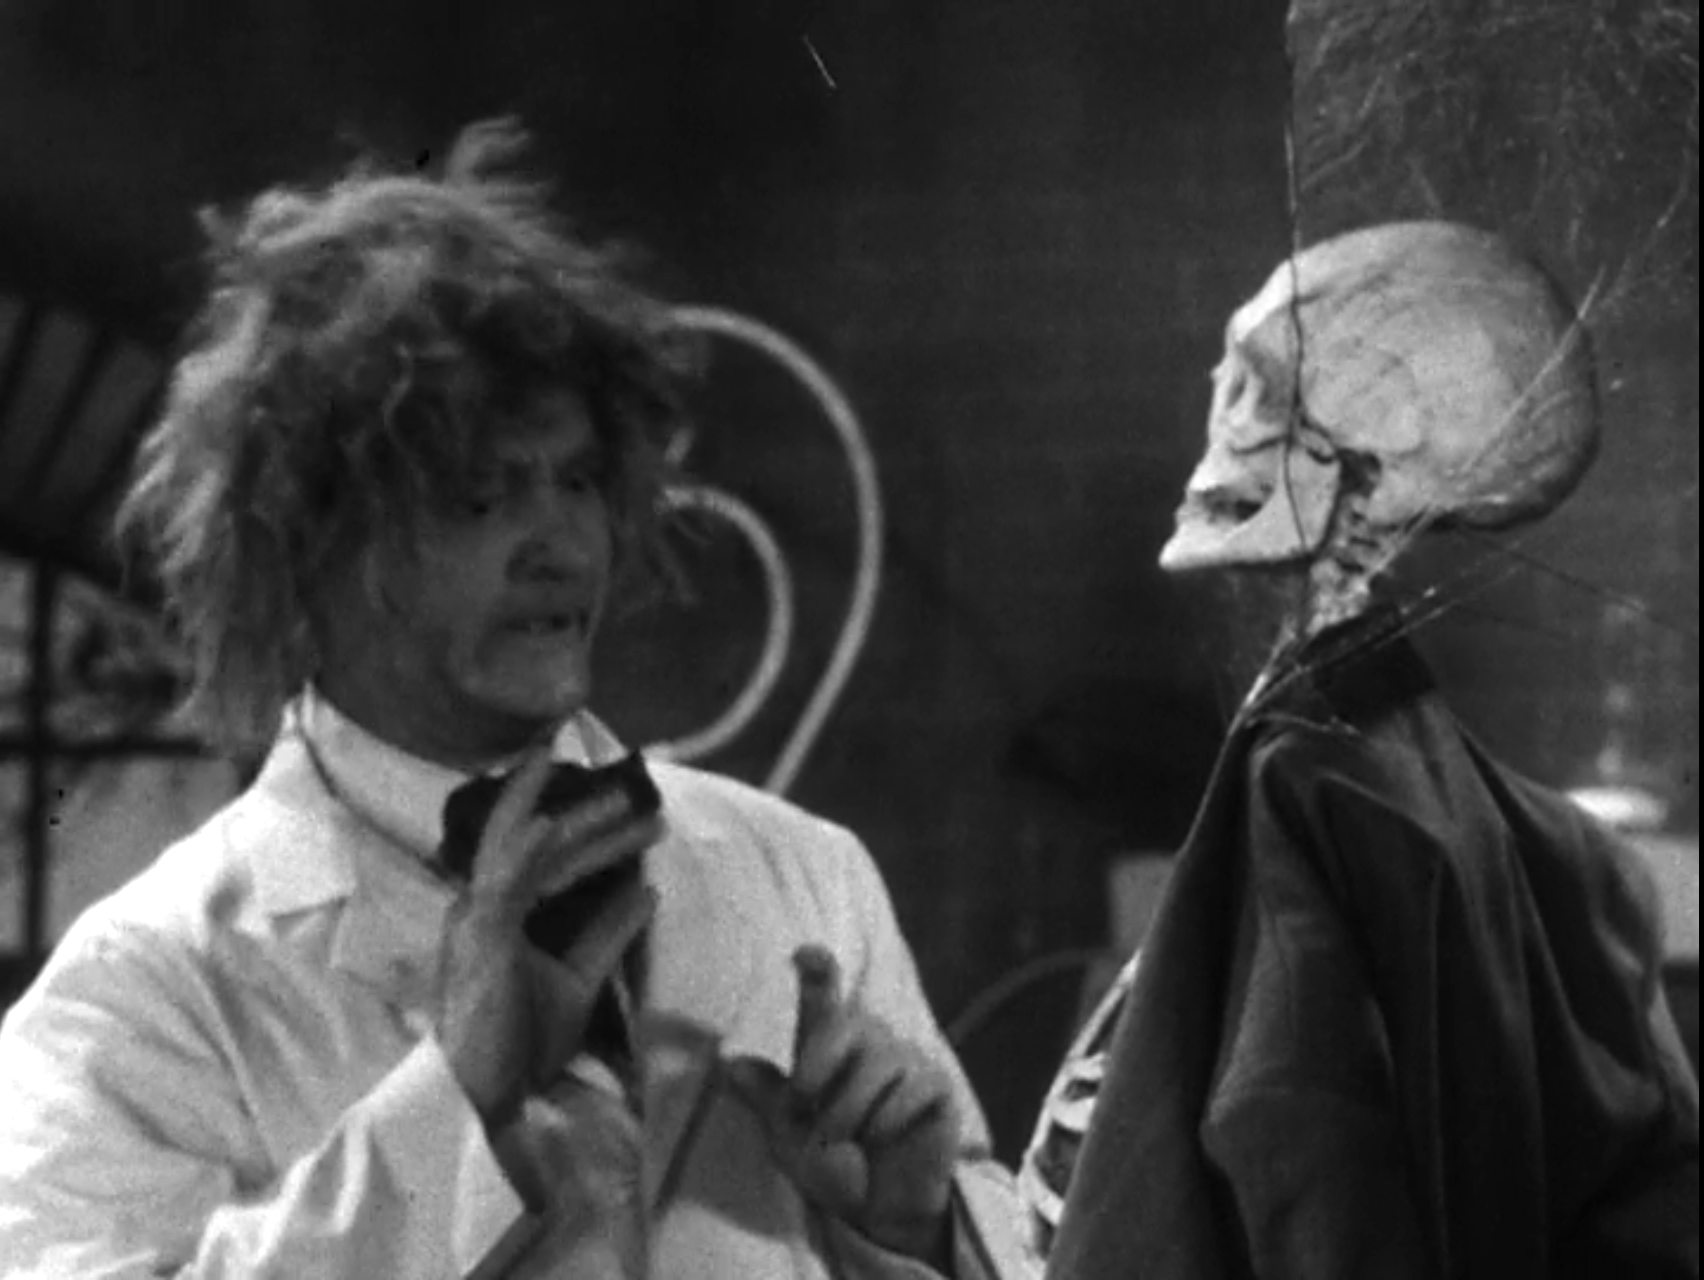 Calling Dr. Prankenstein - The Red Skelton Show season 2